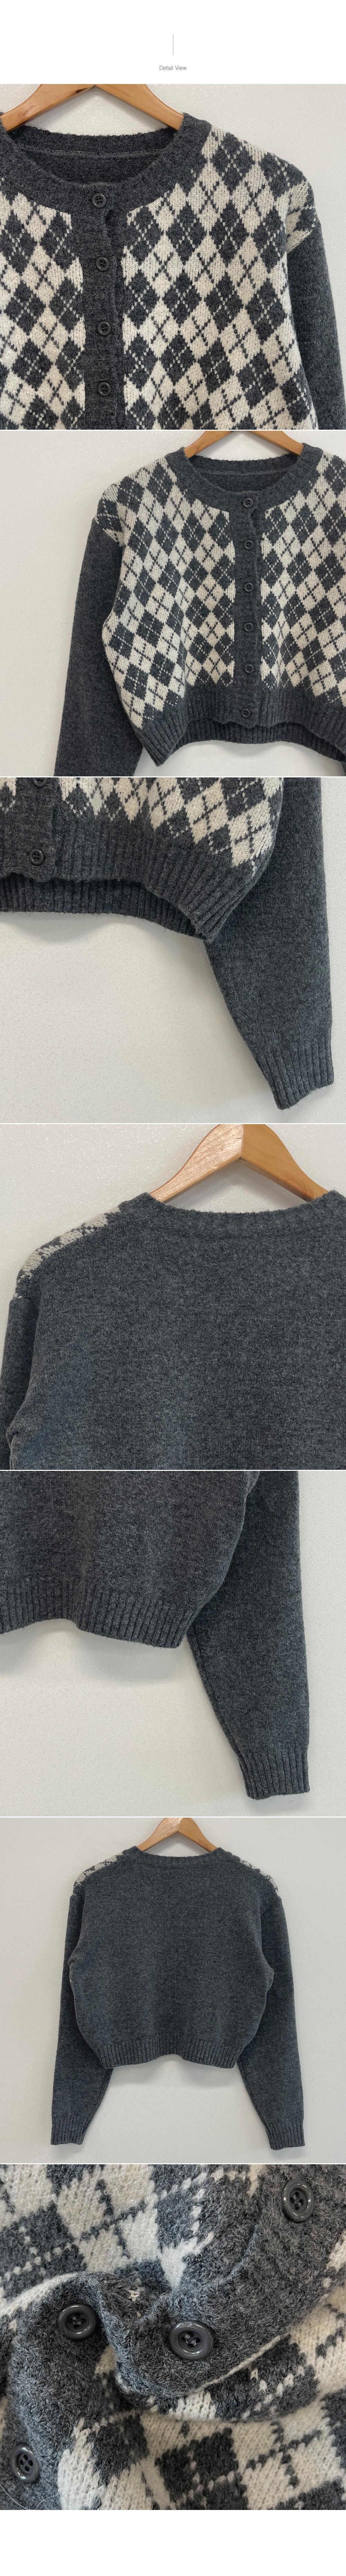 Lander Argyle Round Knitwear Cardigan